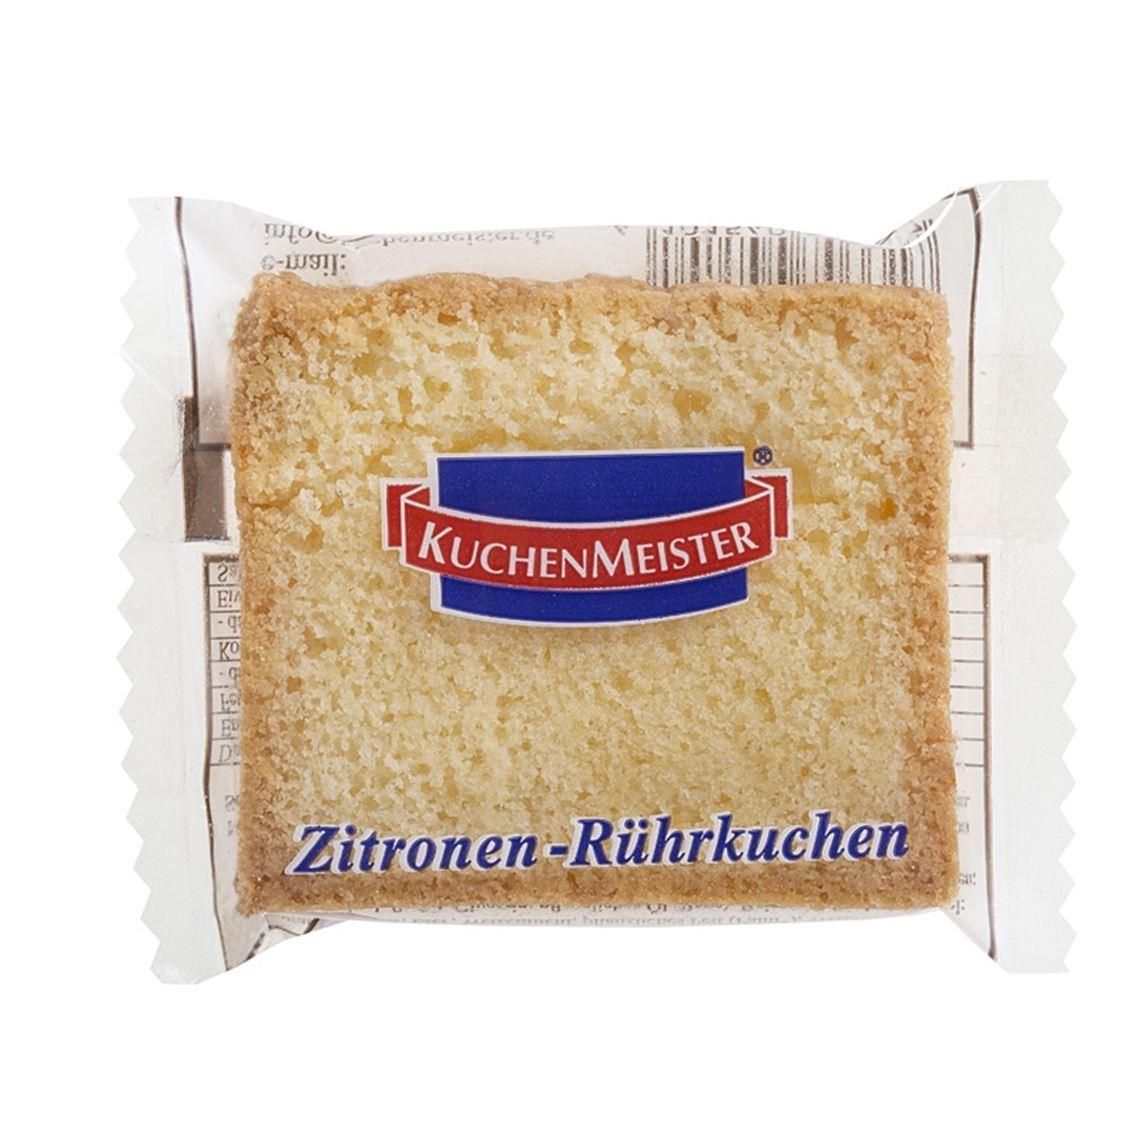 ZITRONENKUCHEN-SCHEIBE KU.25G